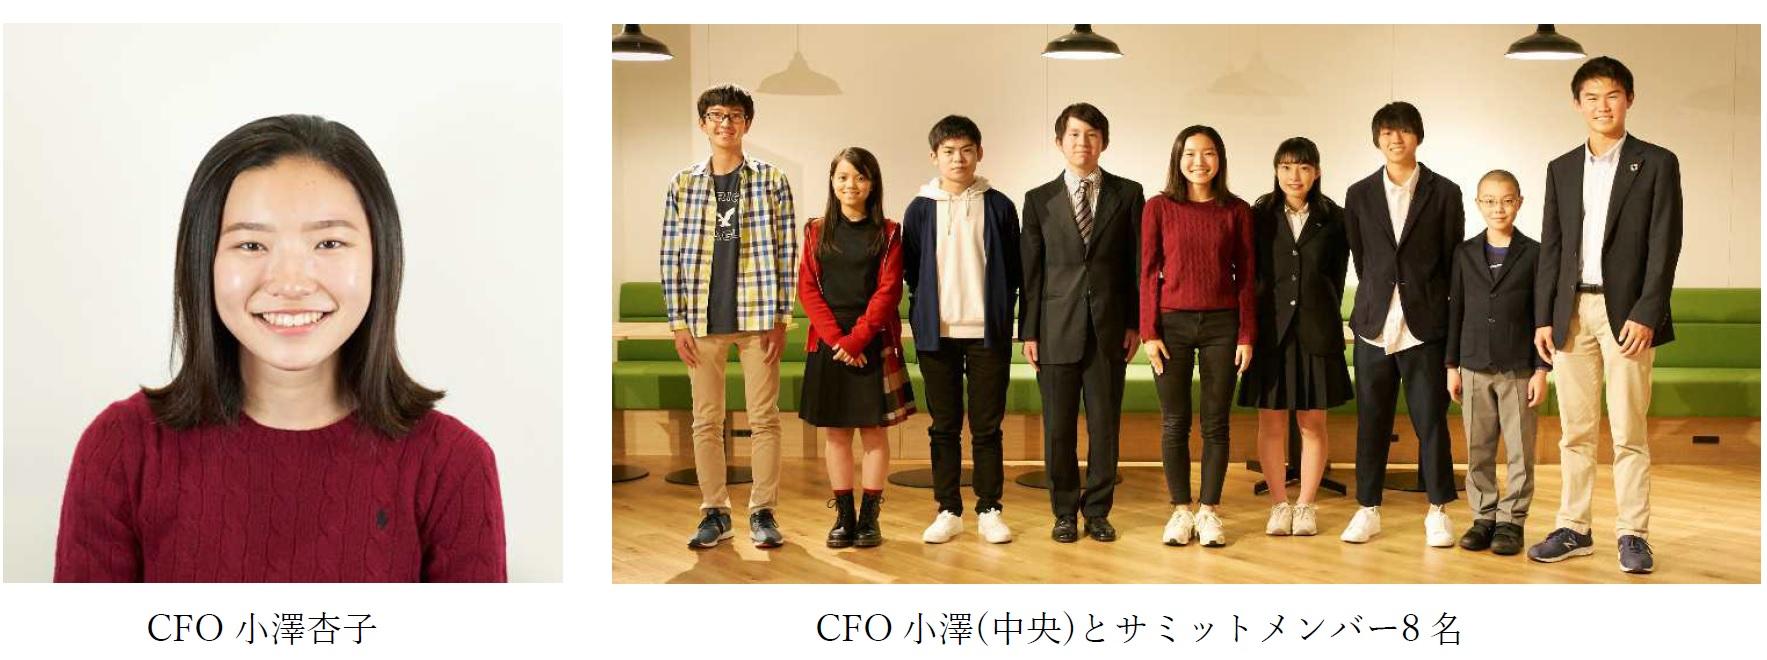 CFO小澤杏子&CFO小澤(中央)とサミットメンバー8名